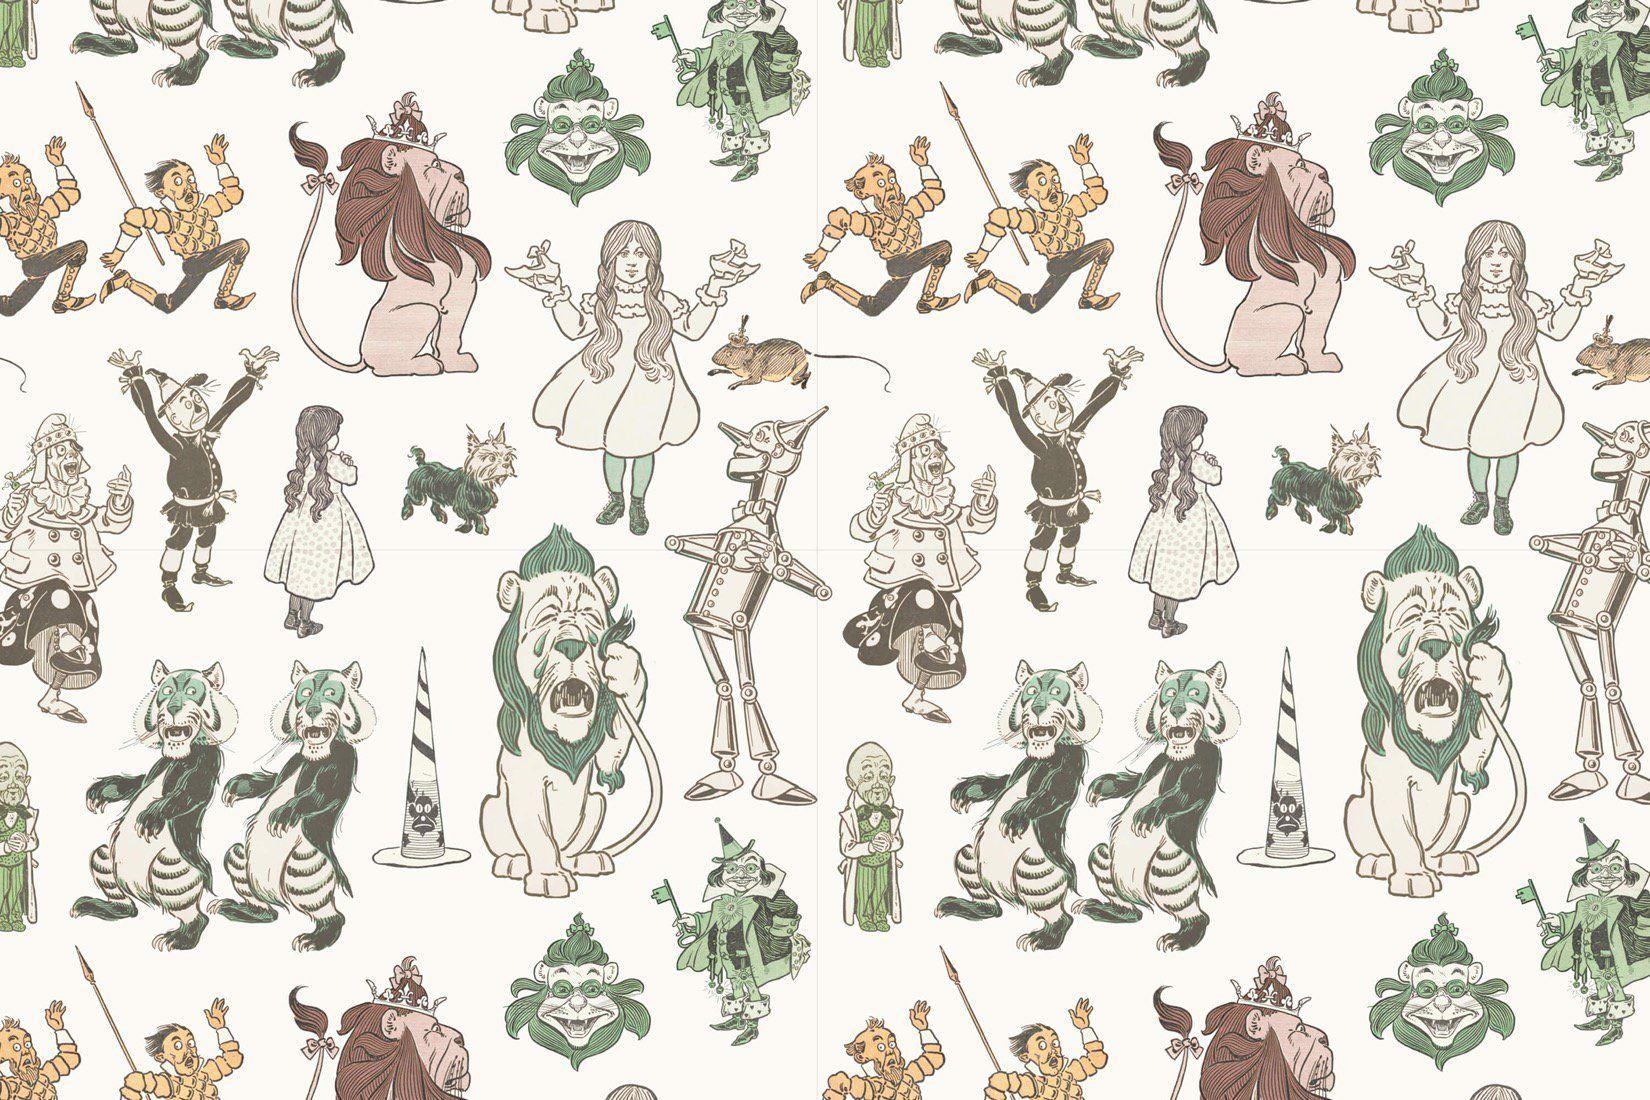 Wizard Of Oz Wallpaper Mural Muralswallpaper Wizard Of Oz